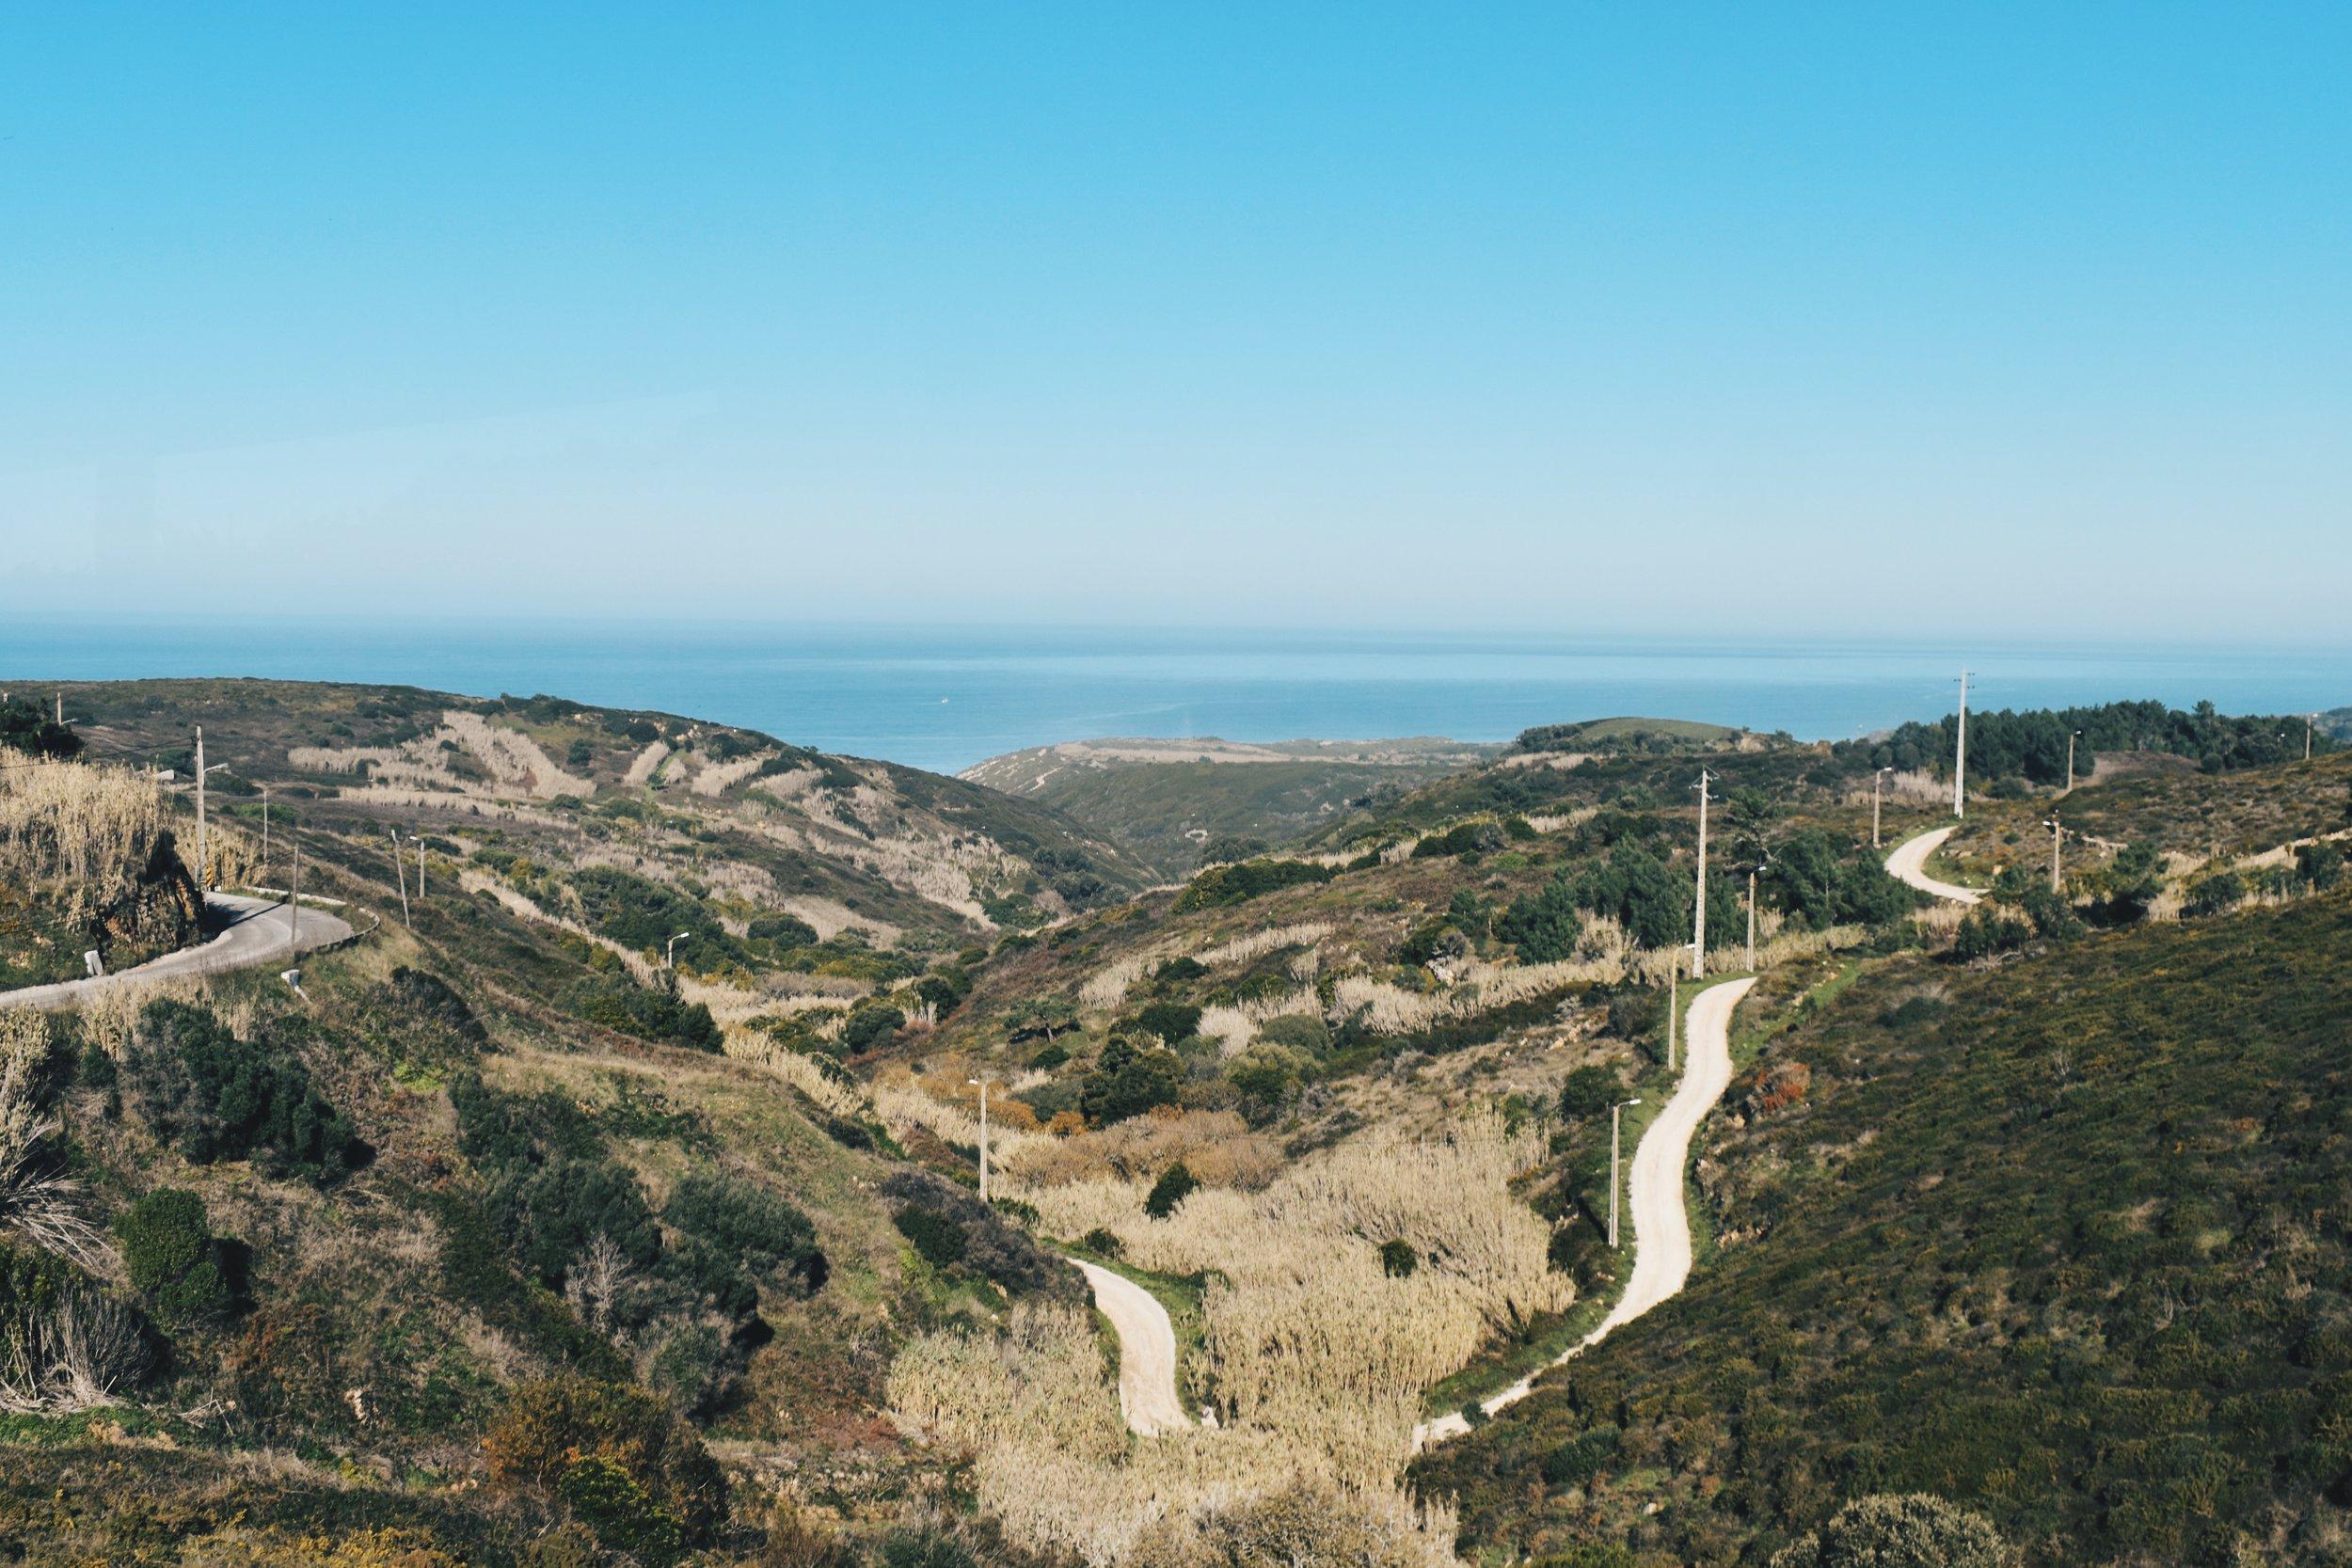 Views from roads along the Atlantic Coast